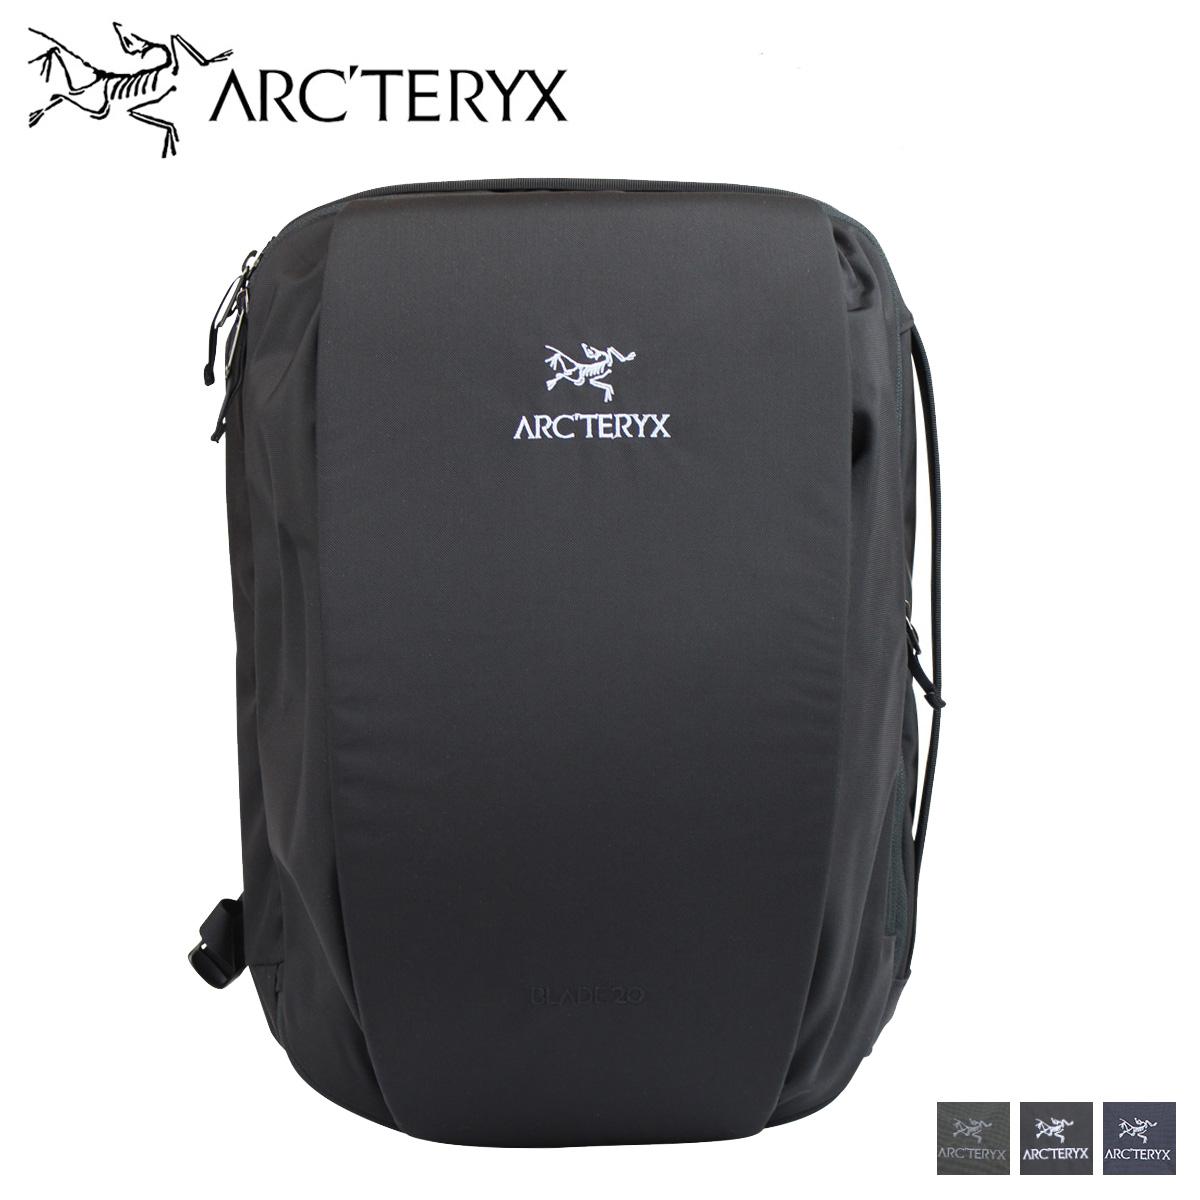 ARCTERYX BLADE 20 アークテリクス リュック バックパック バッグ メンズ 20L ブブラック グレー ネイビー 黒 16179